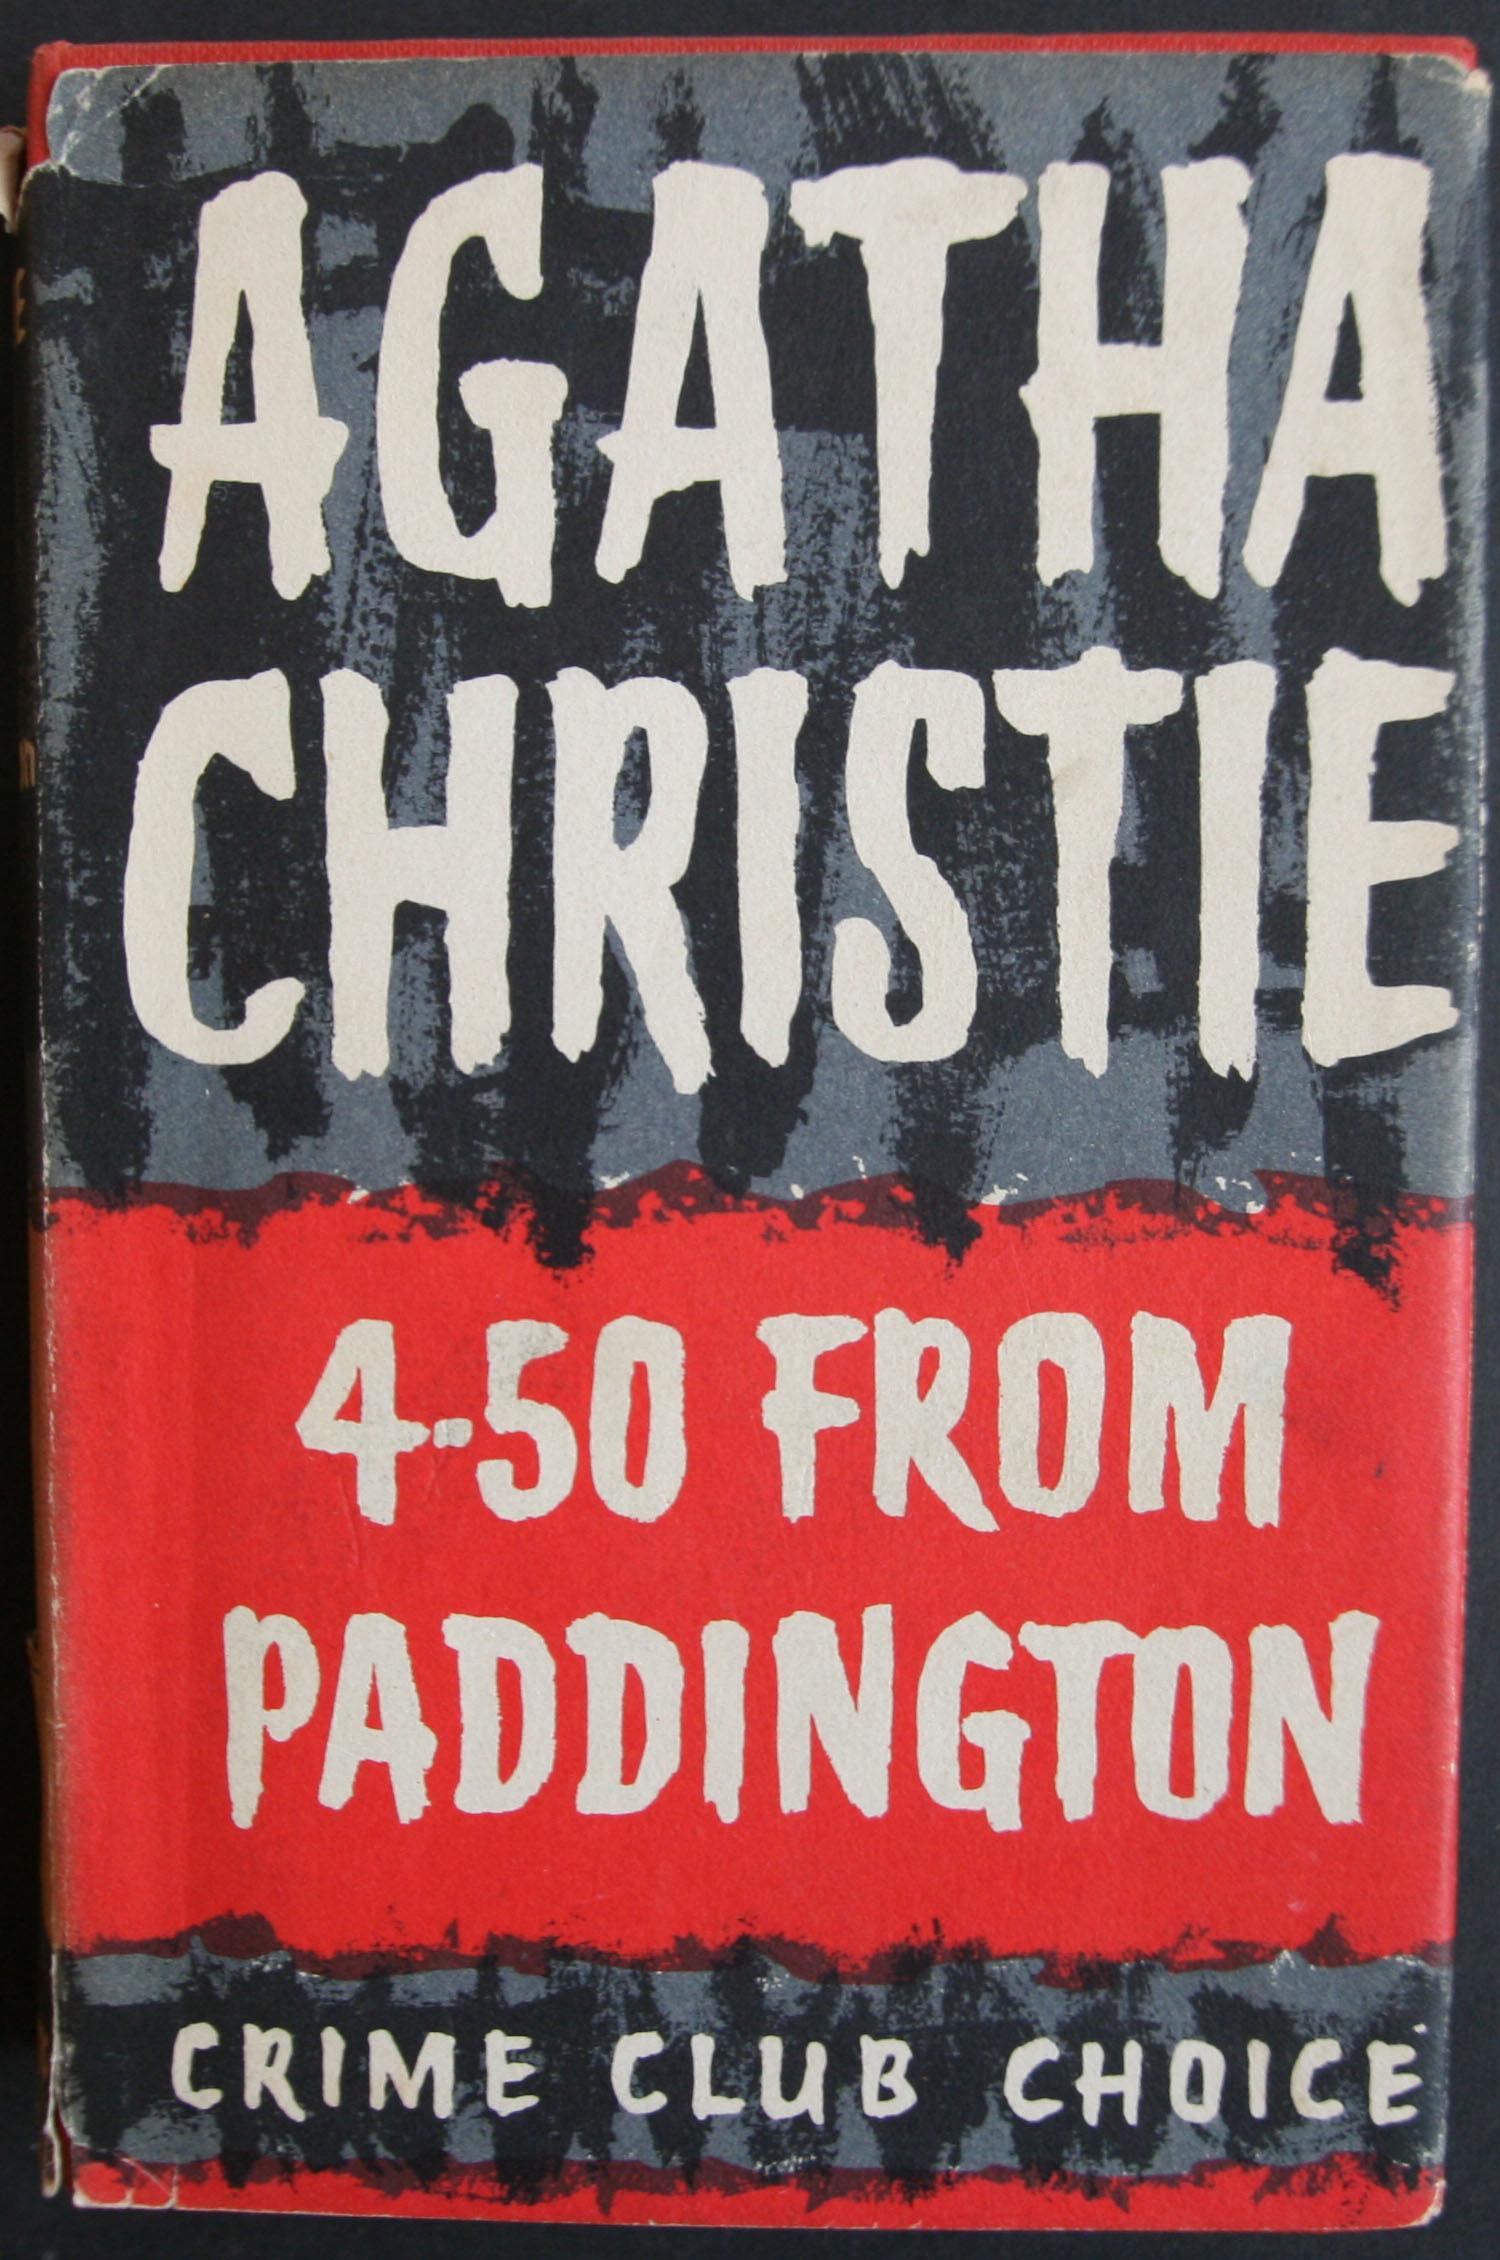 Agatha Christie first edition